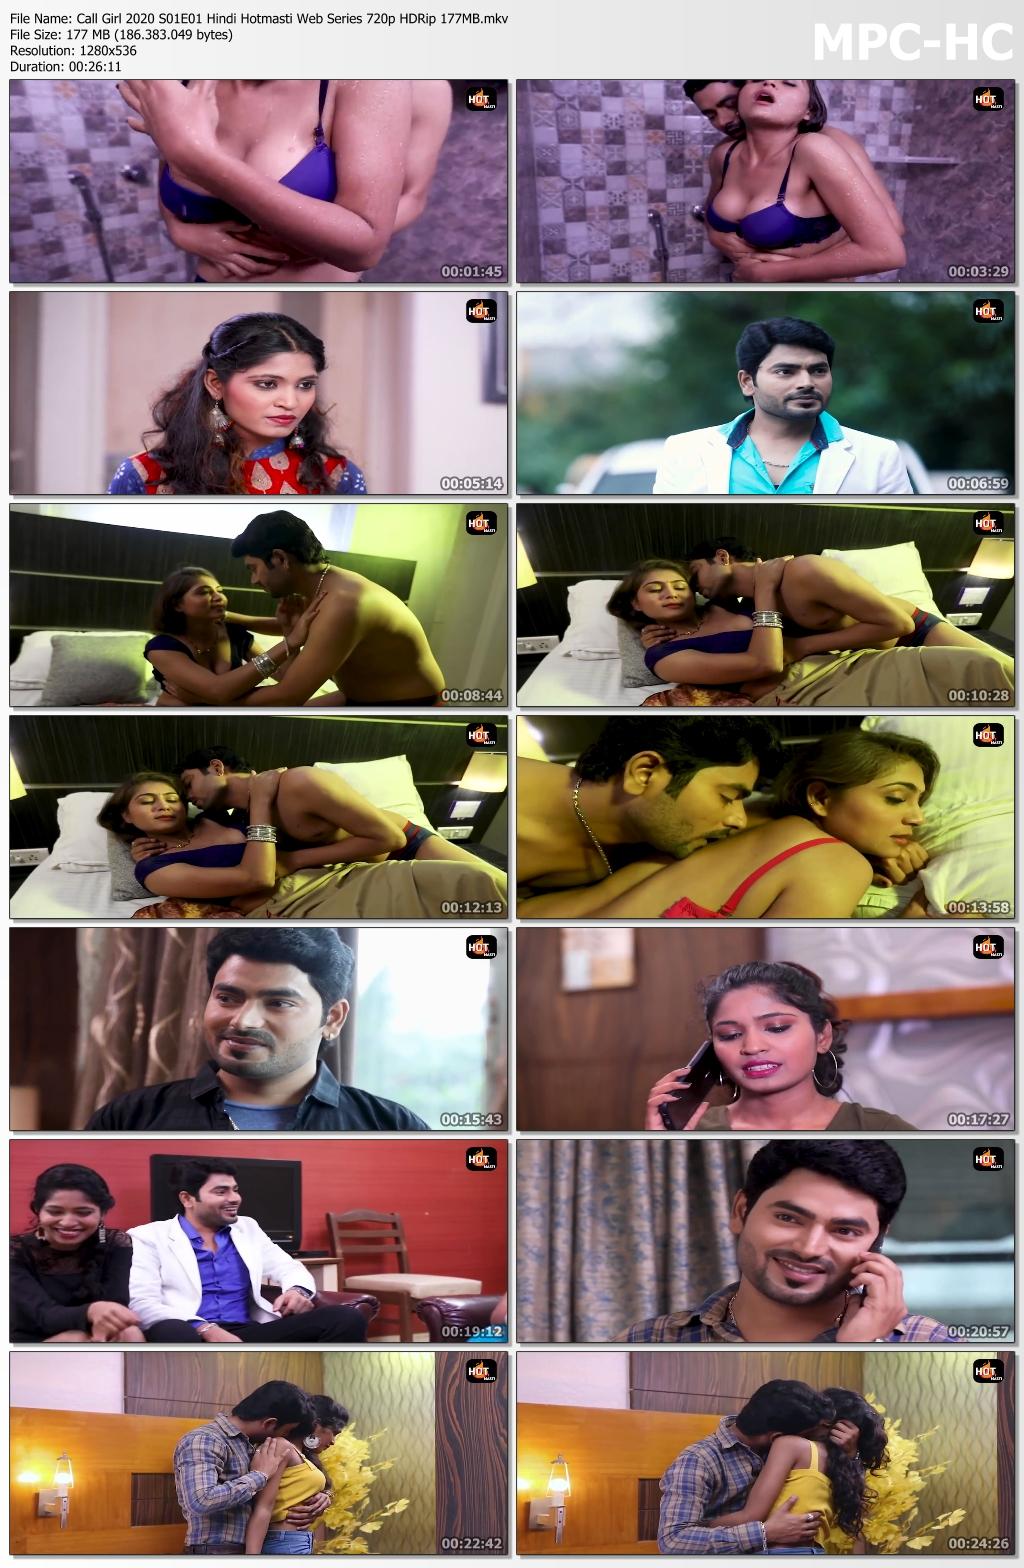 Call-Girl-2020-S01-E01-Hindi-Hotmasti-Web-Series-720p-HDRip-177-MB-mkv-thumbs